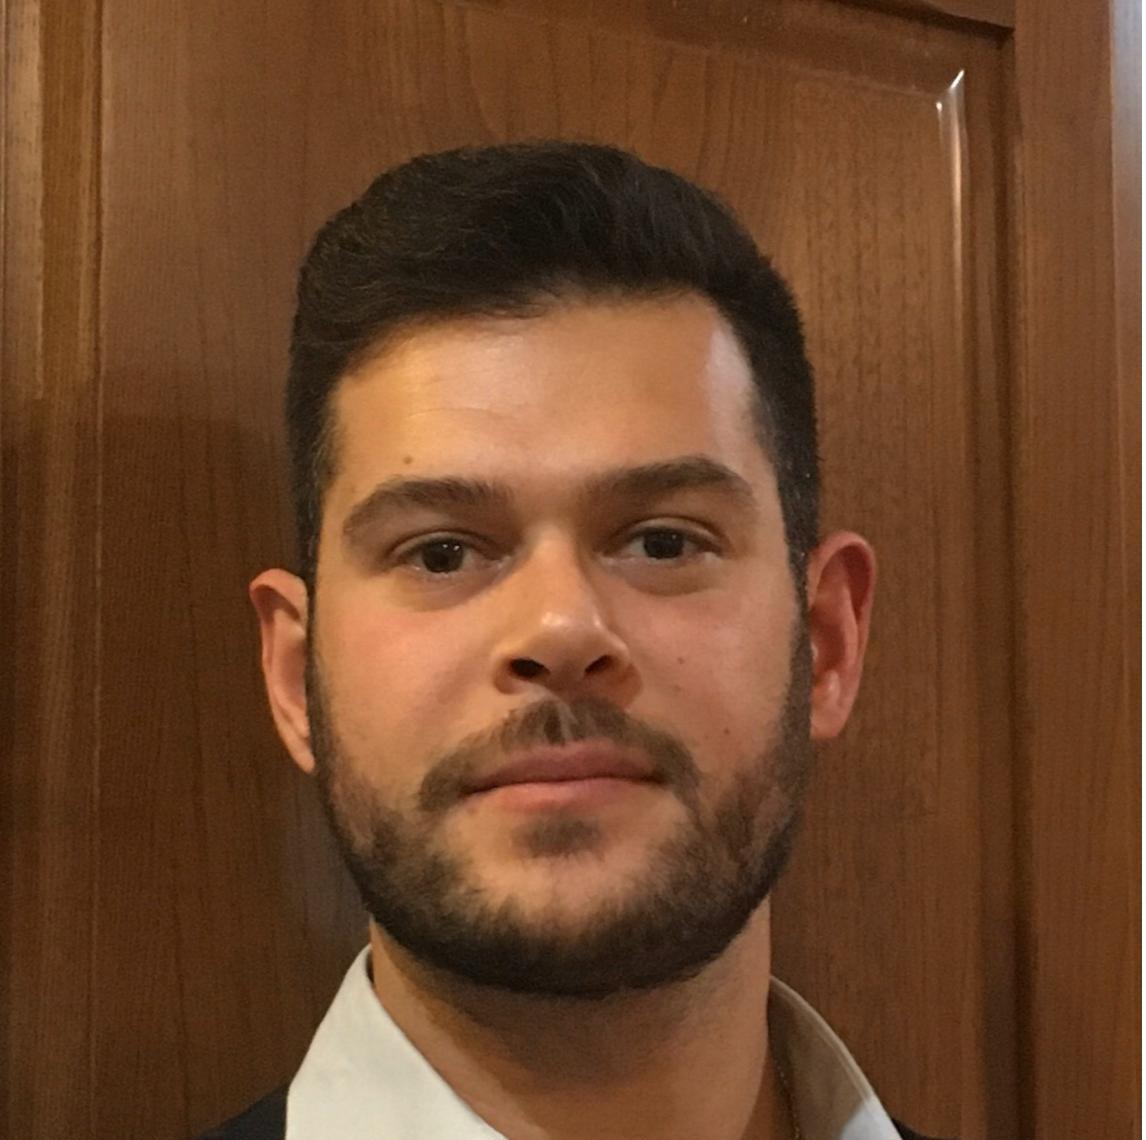 Daniele Biafora